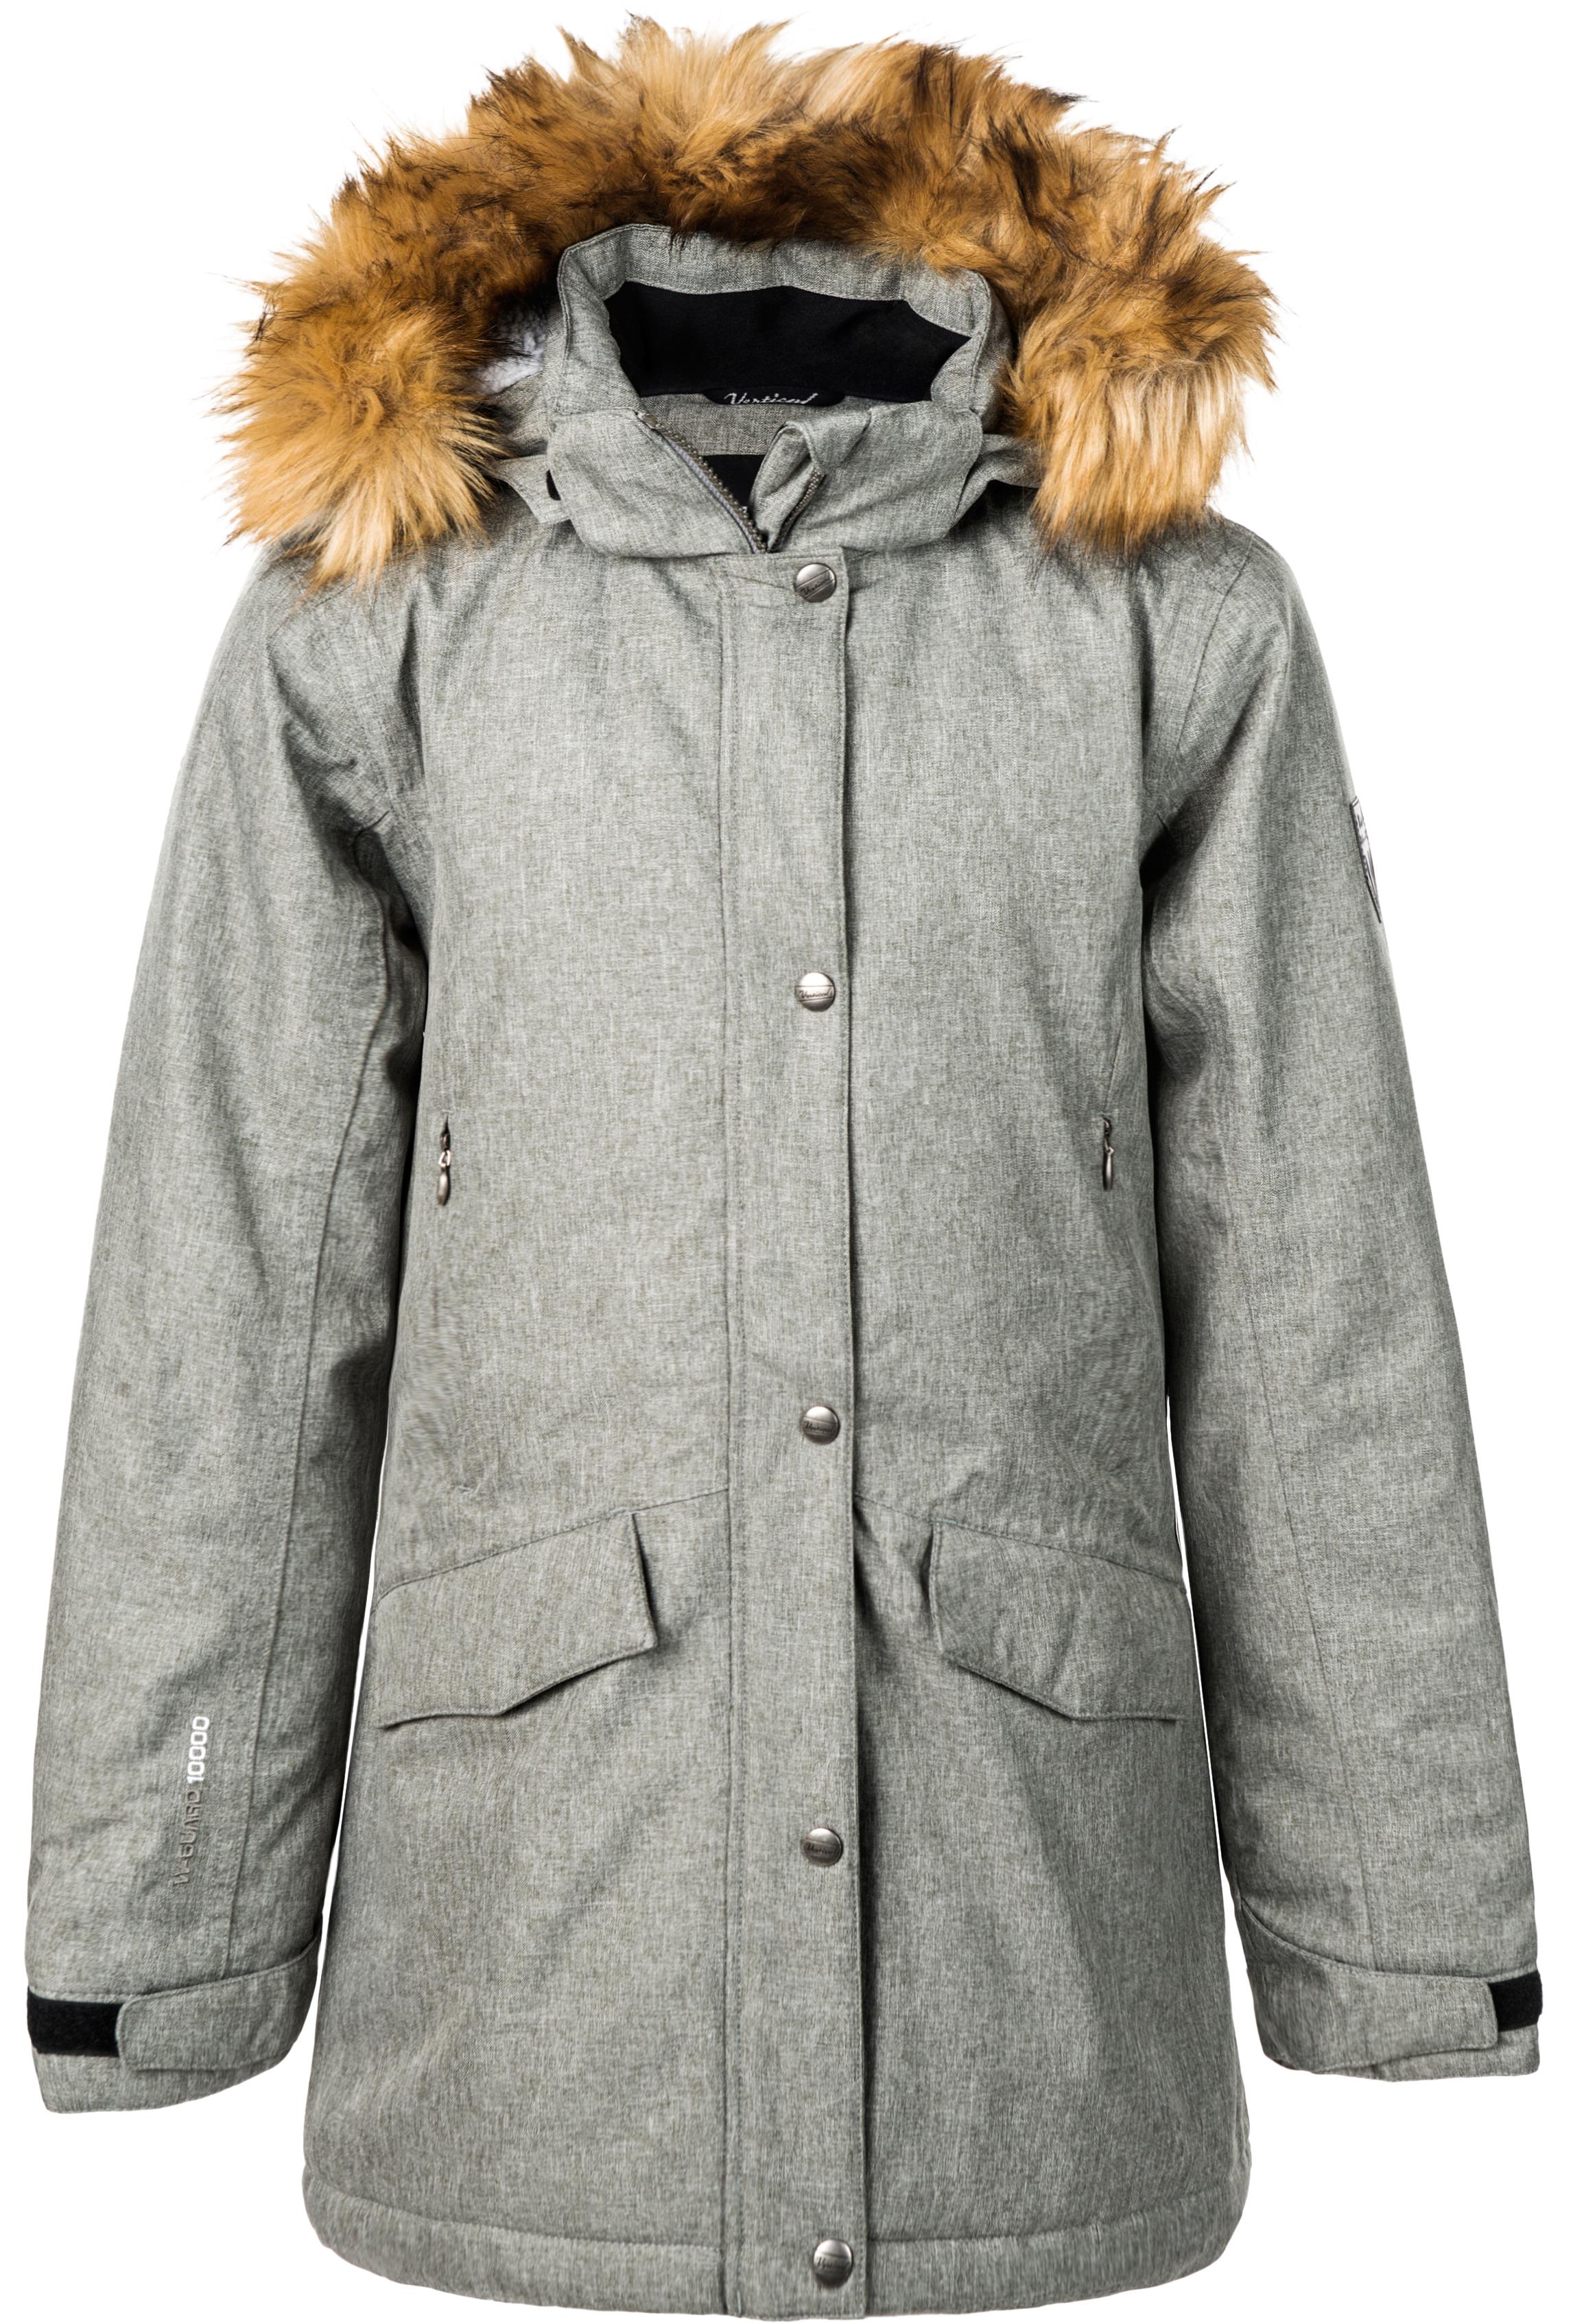 Urban Classics Sherpa Lined Cotton - Naisten Parka